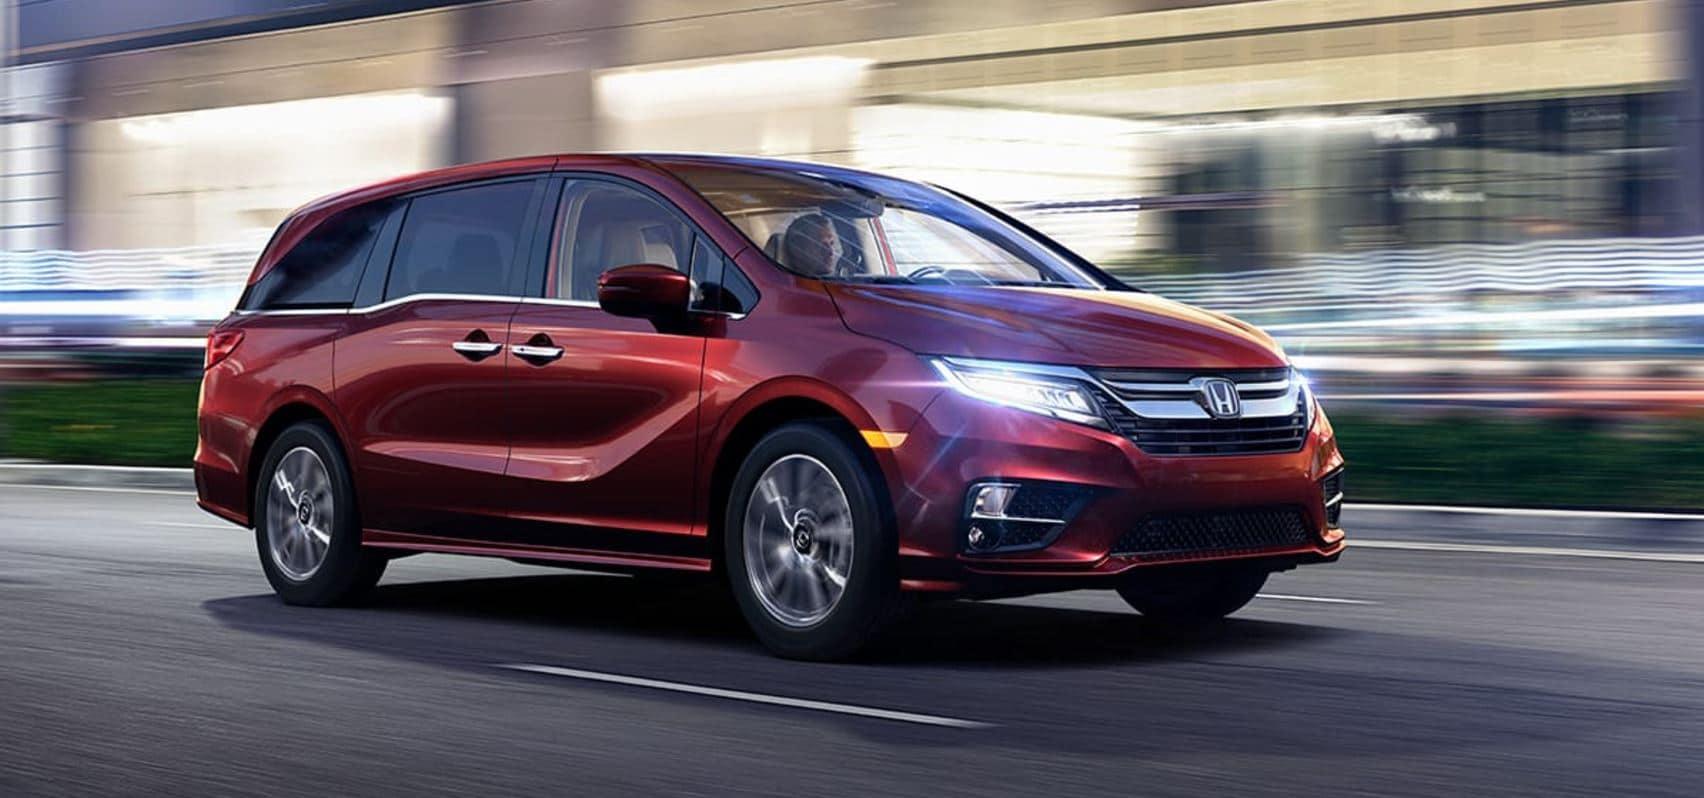 Preview The 2018 Honda Odyssey